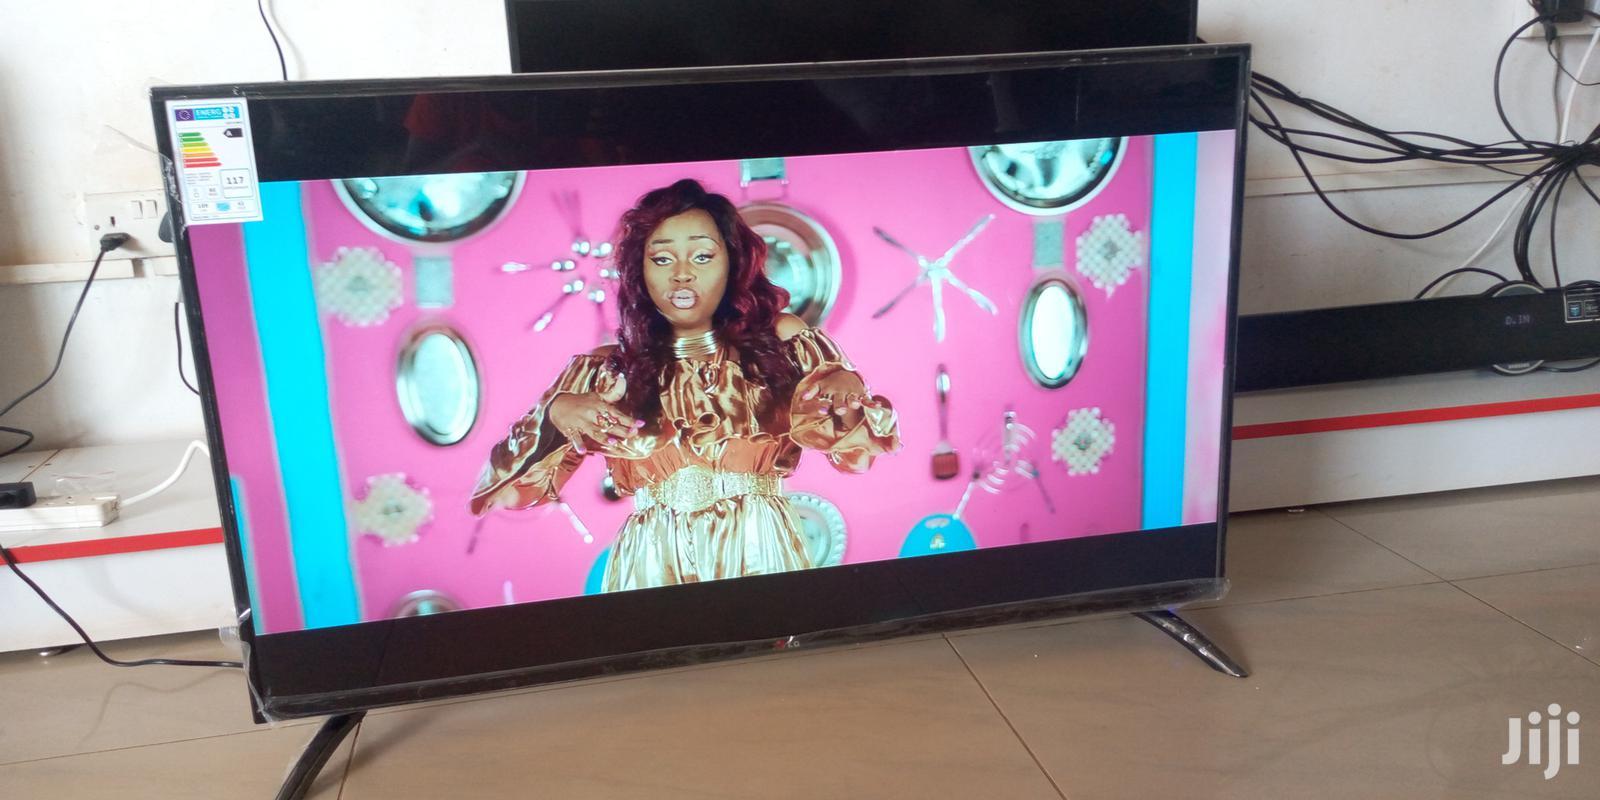 Archive: Lg Flat Screen Digital Tv 43 Inches